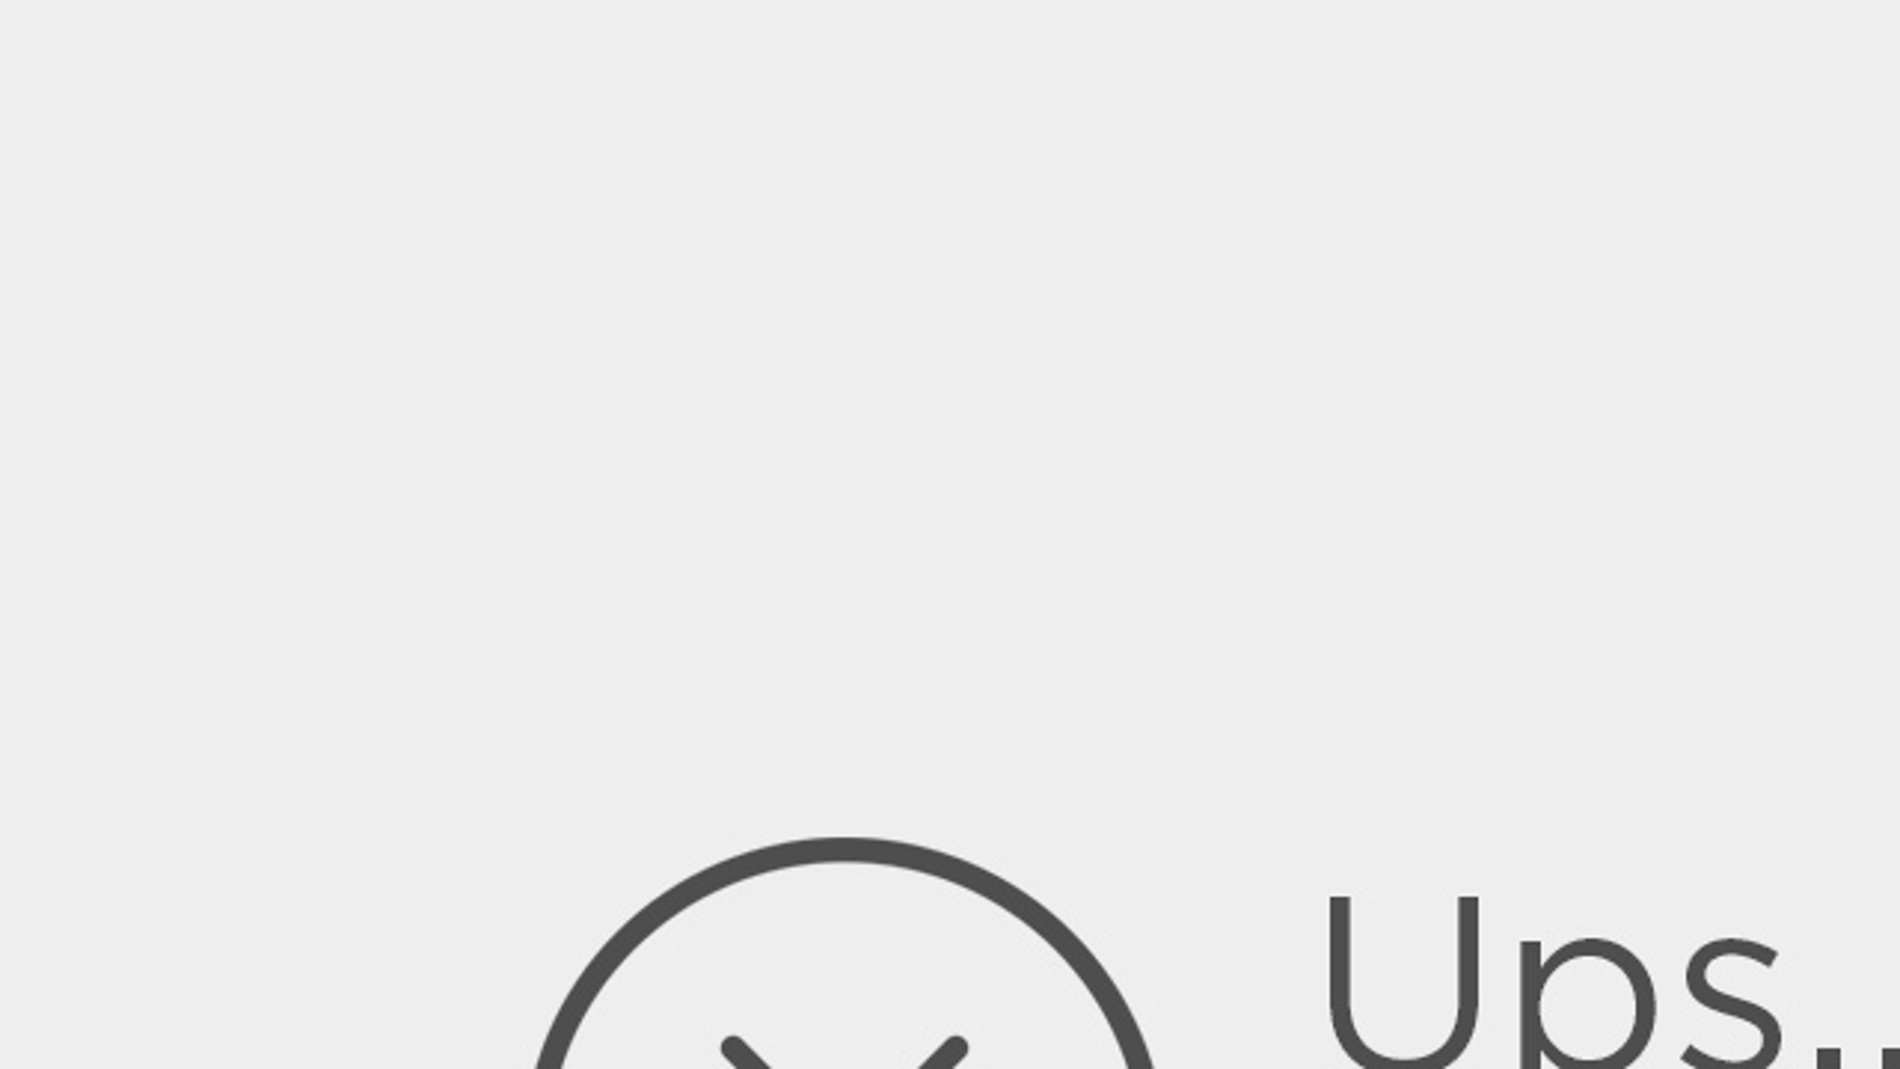 A.J. McLean, Nick Carter, Joey Fatone